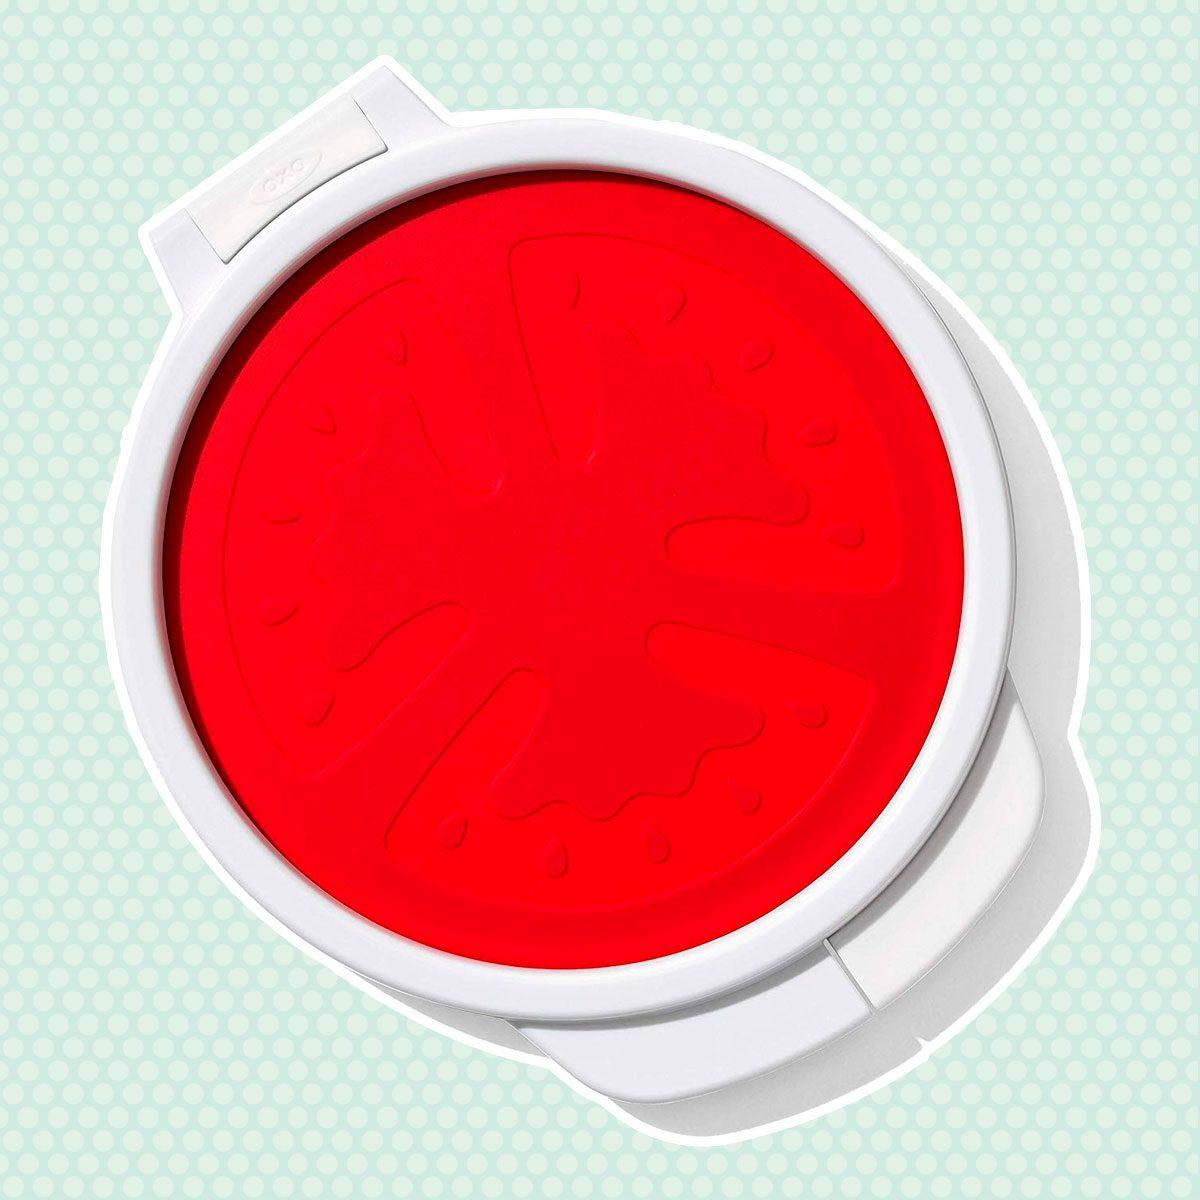 OXO Good Grips Cut & Keep Tomato Saver